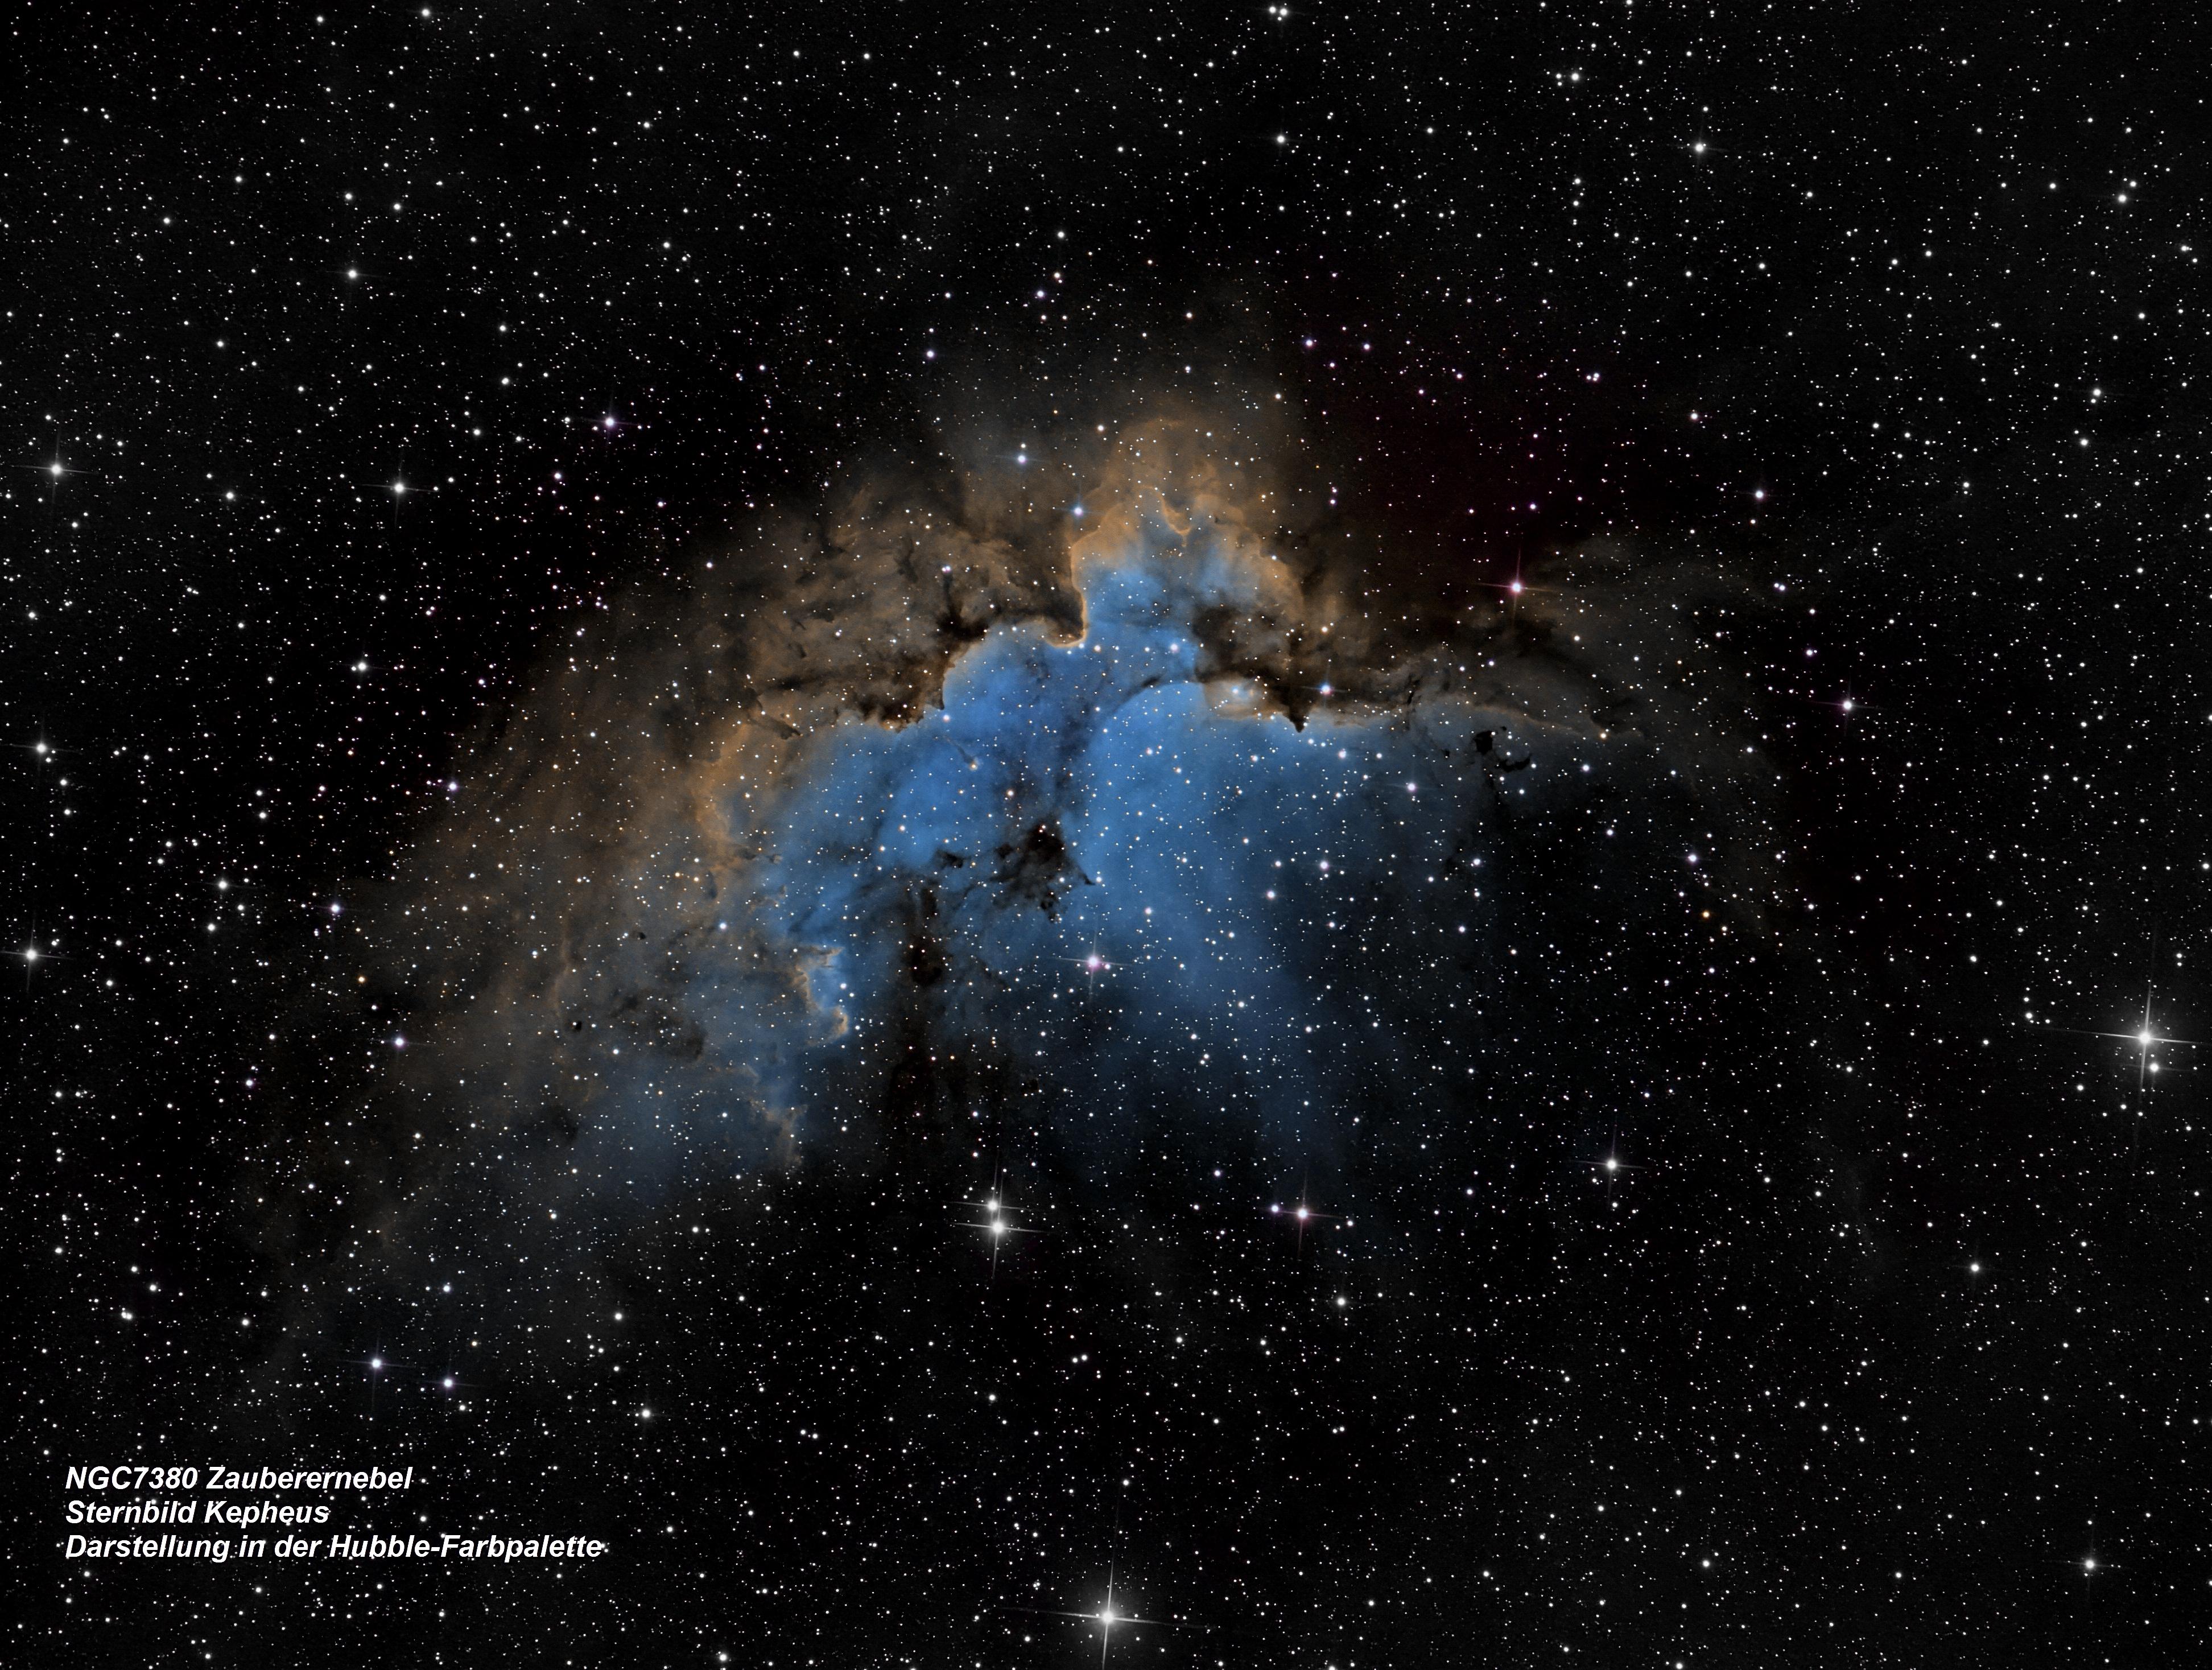 NGC7380 Zauberernebel (Hubble-Farbpalette)